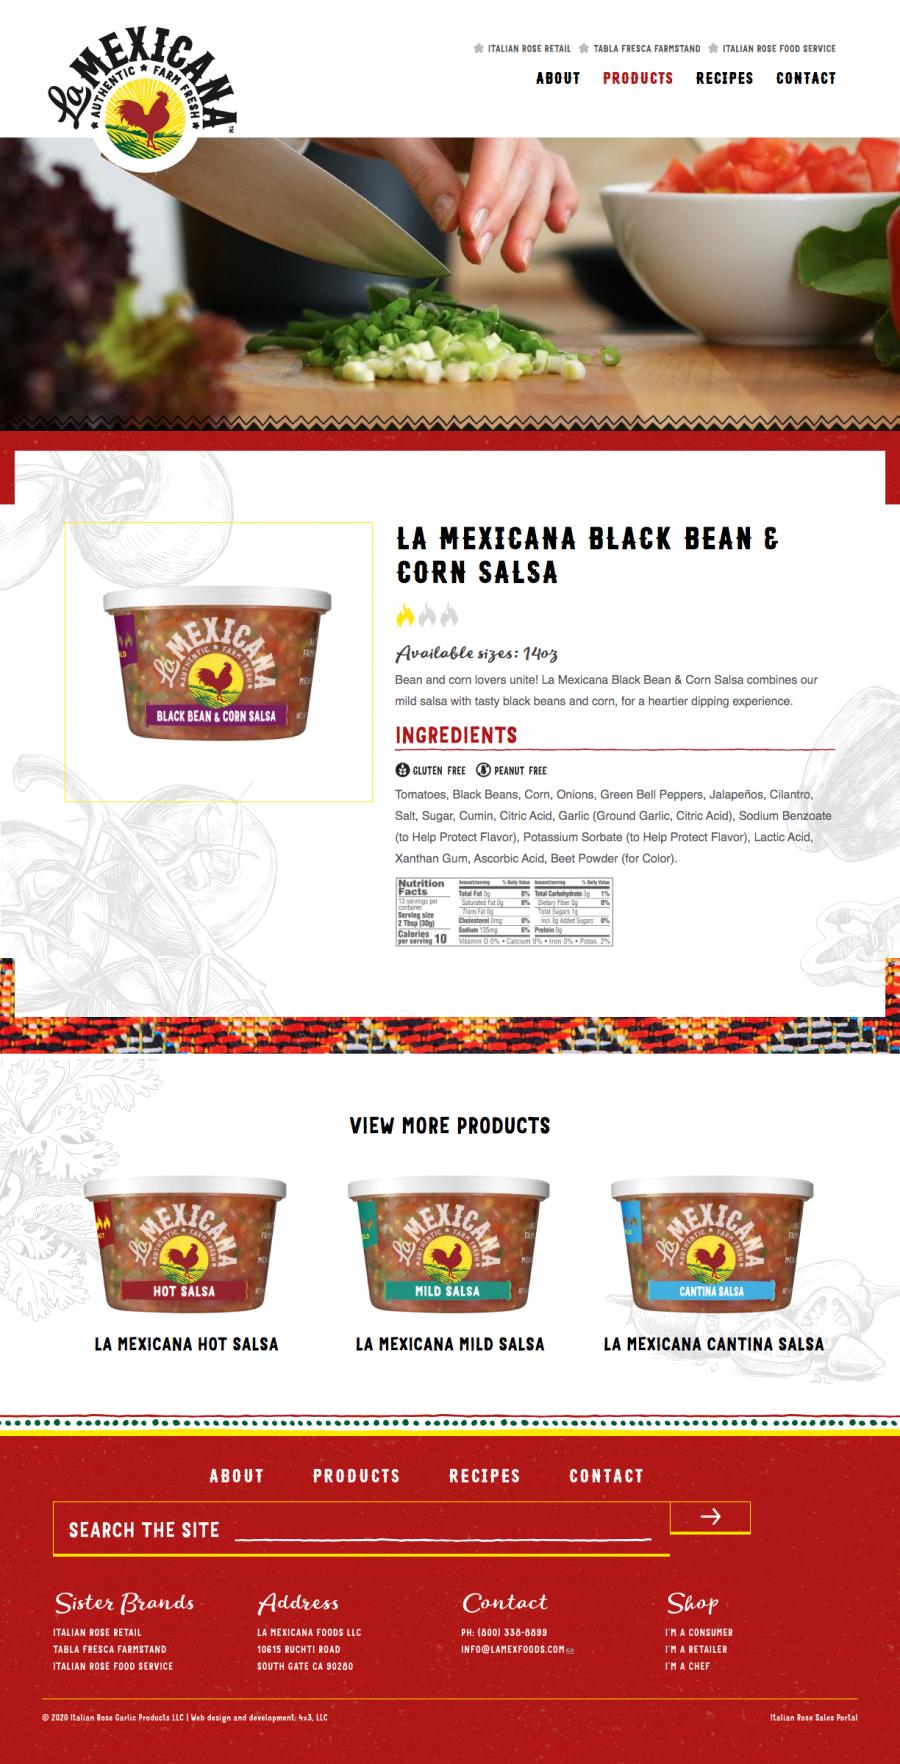 La Mexicana product page